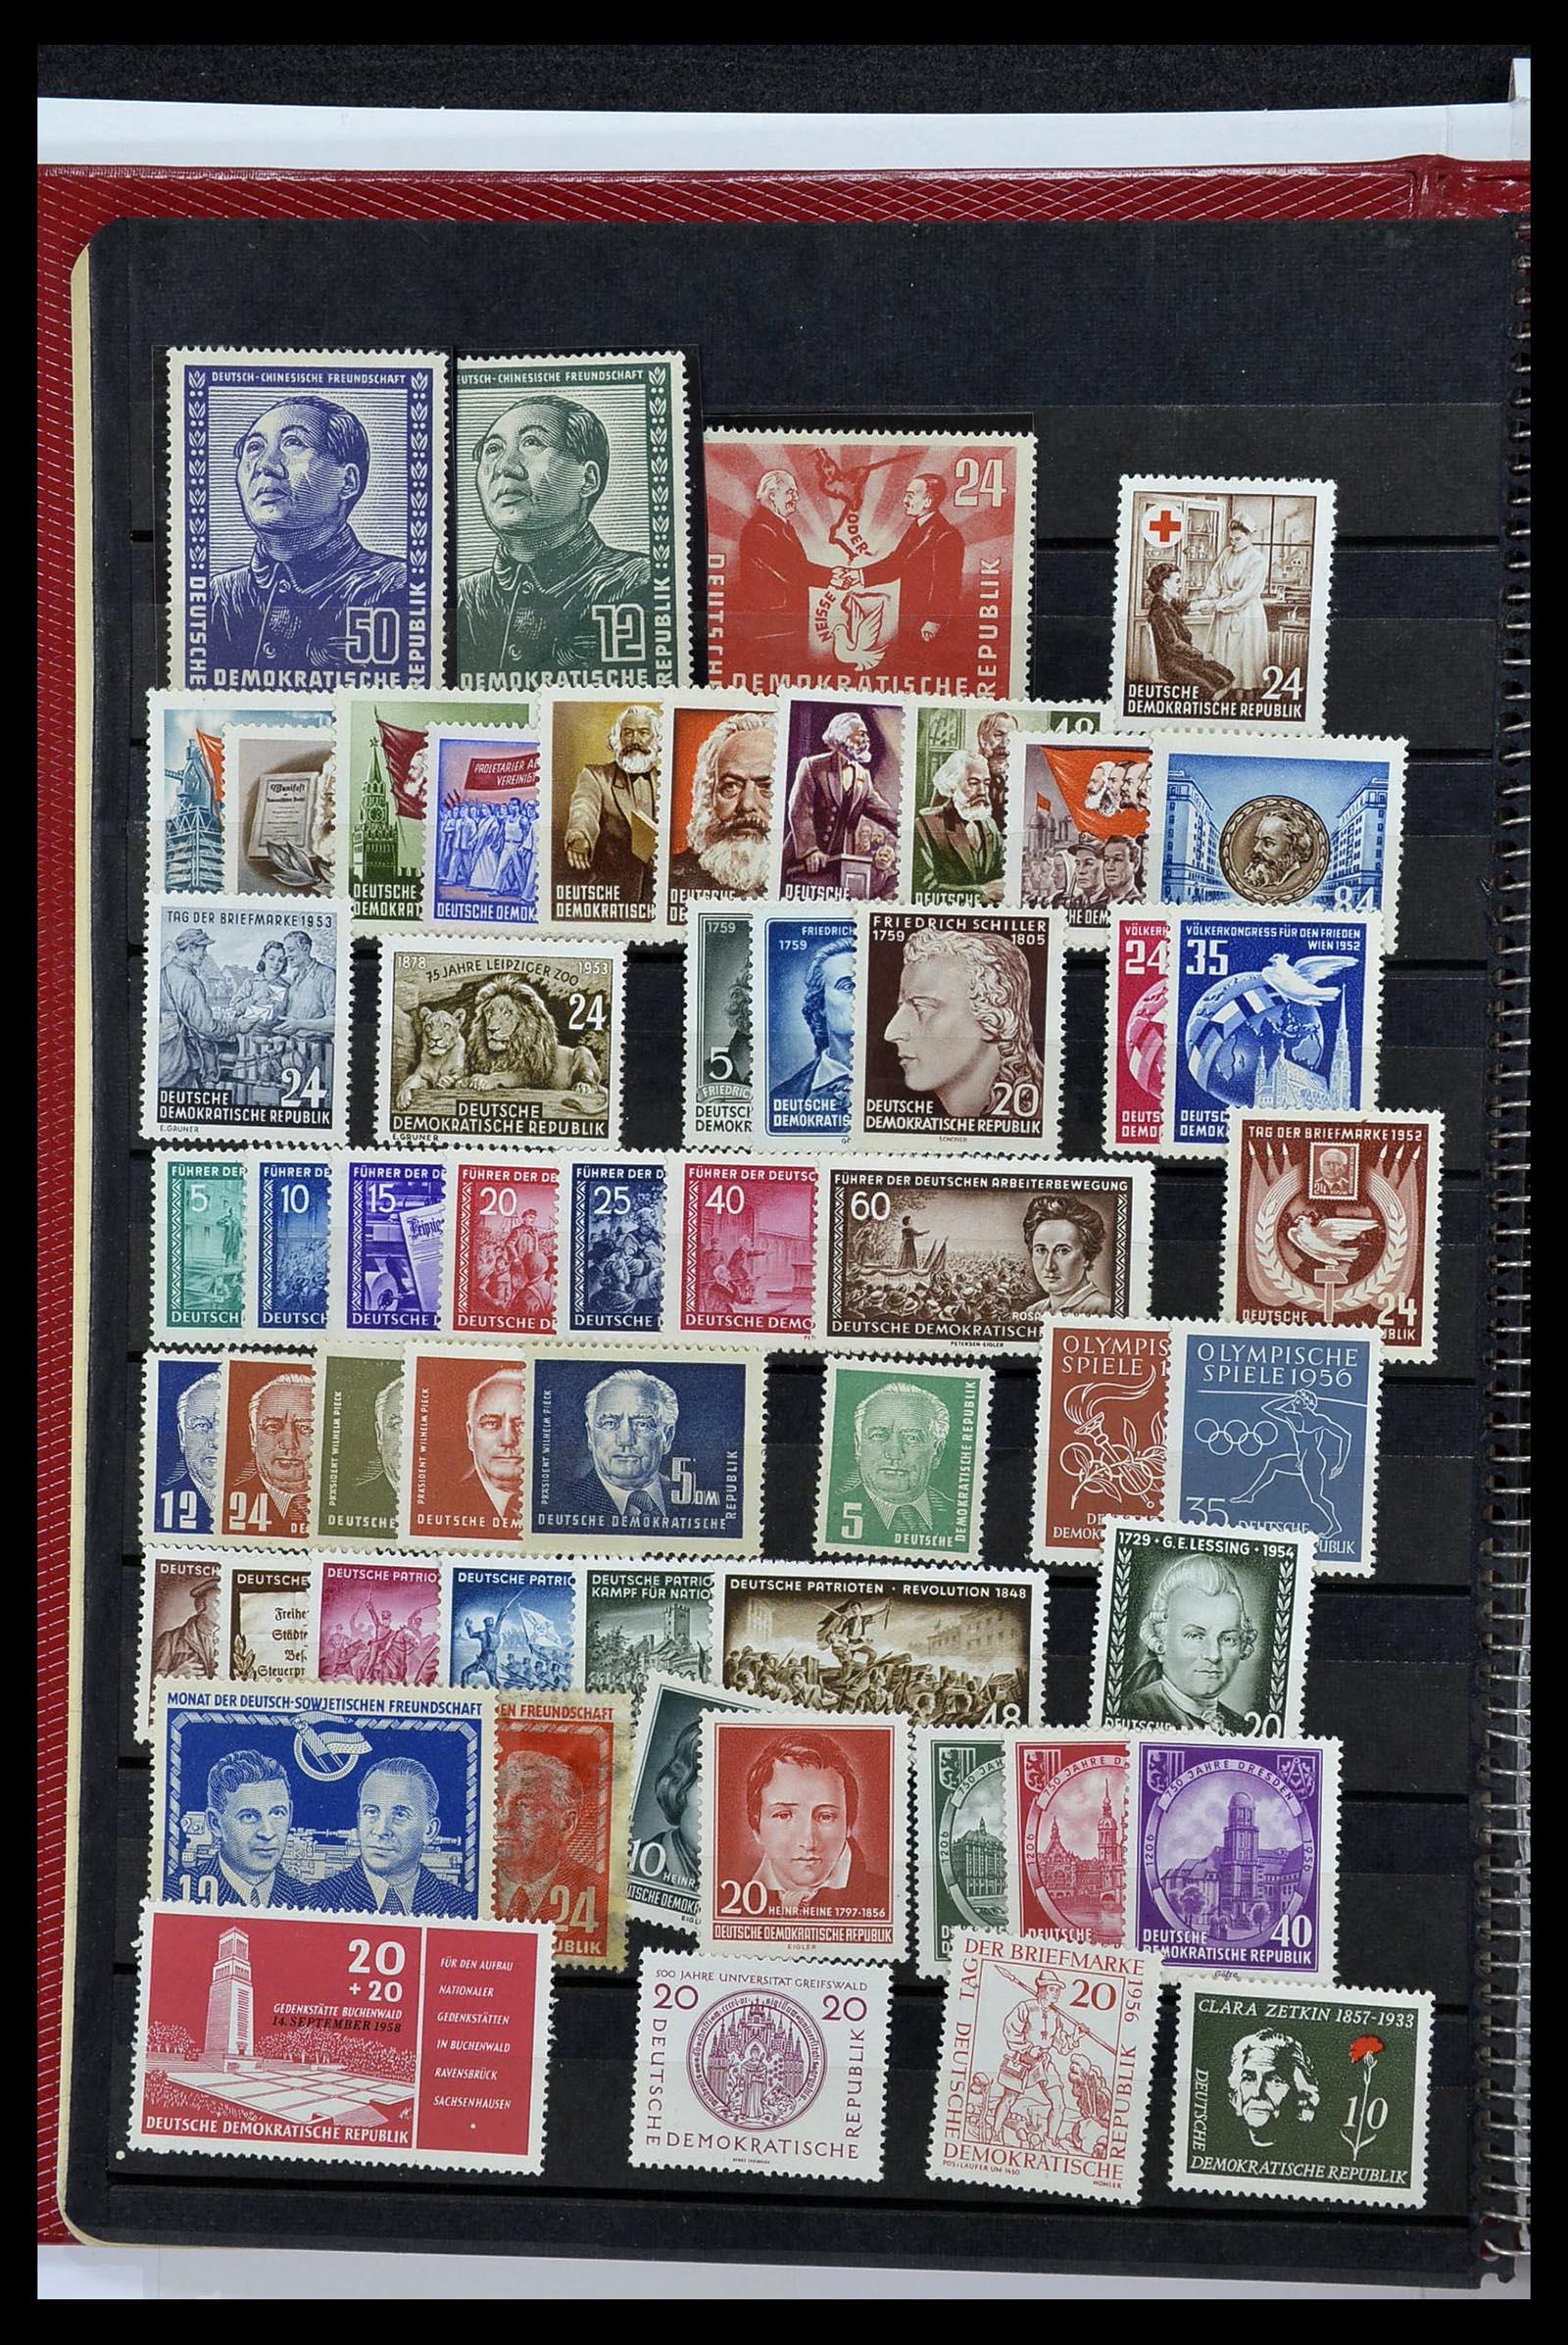 34169 002 - Postzegelverzameling 34169 Duitsland 1880-1955.